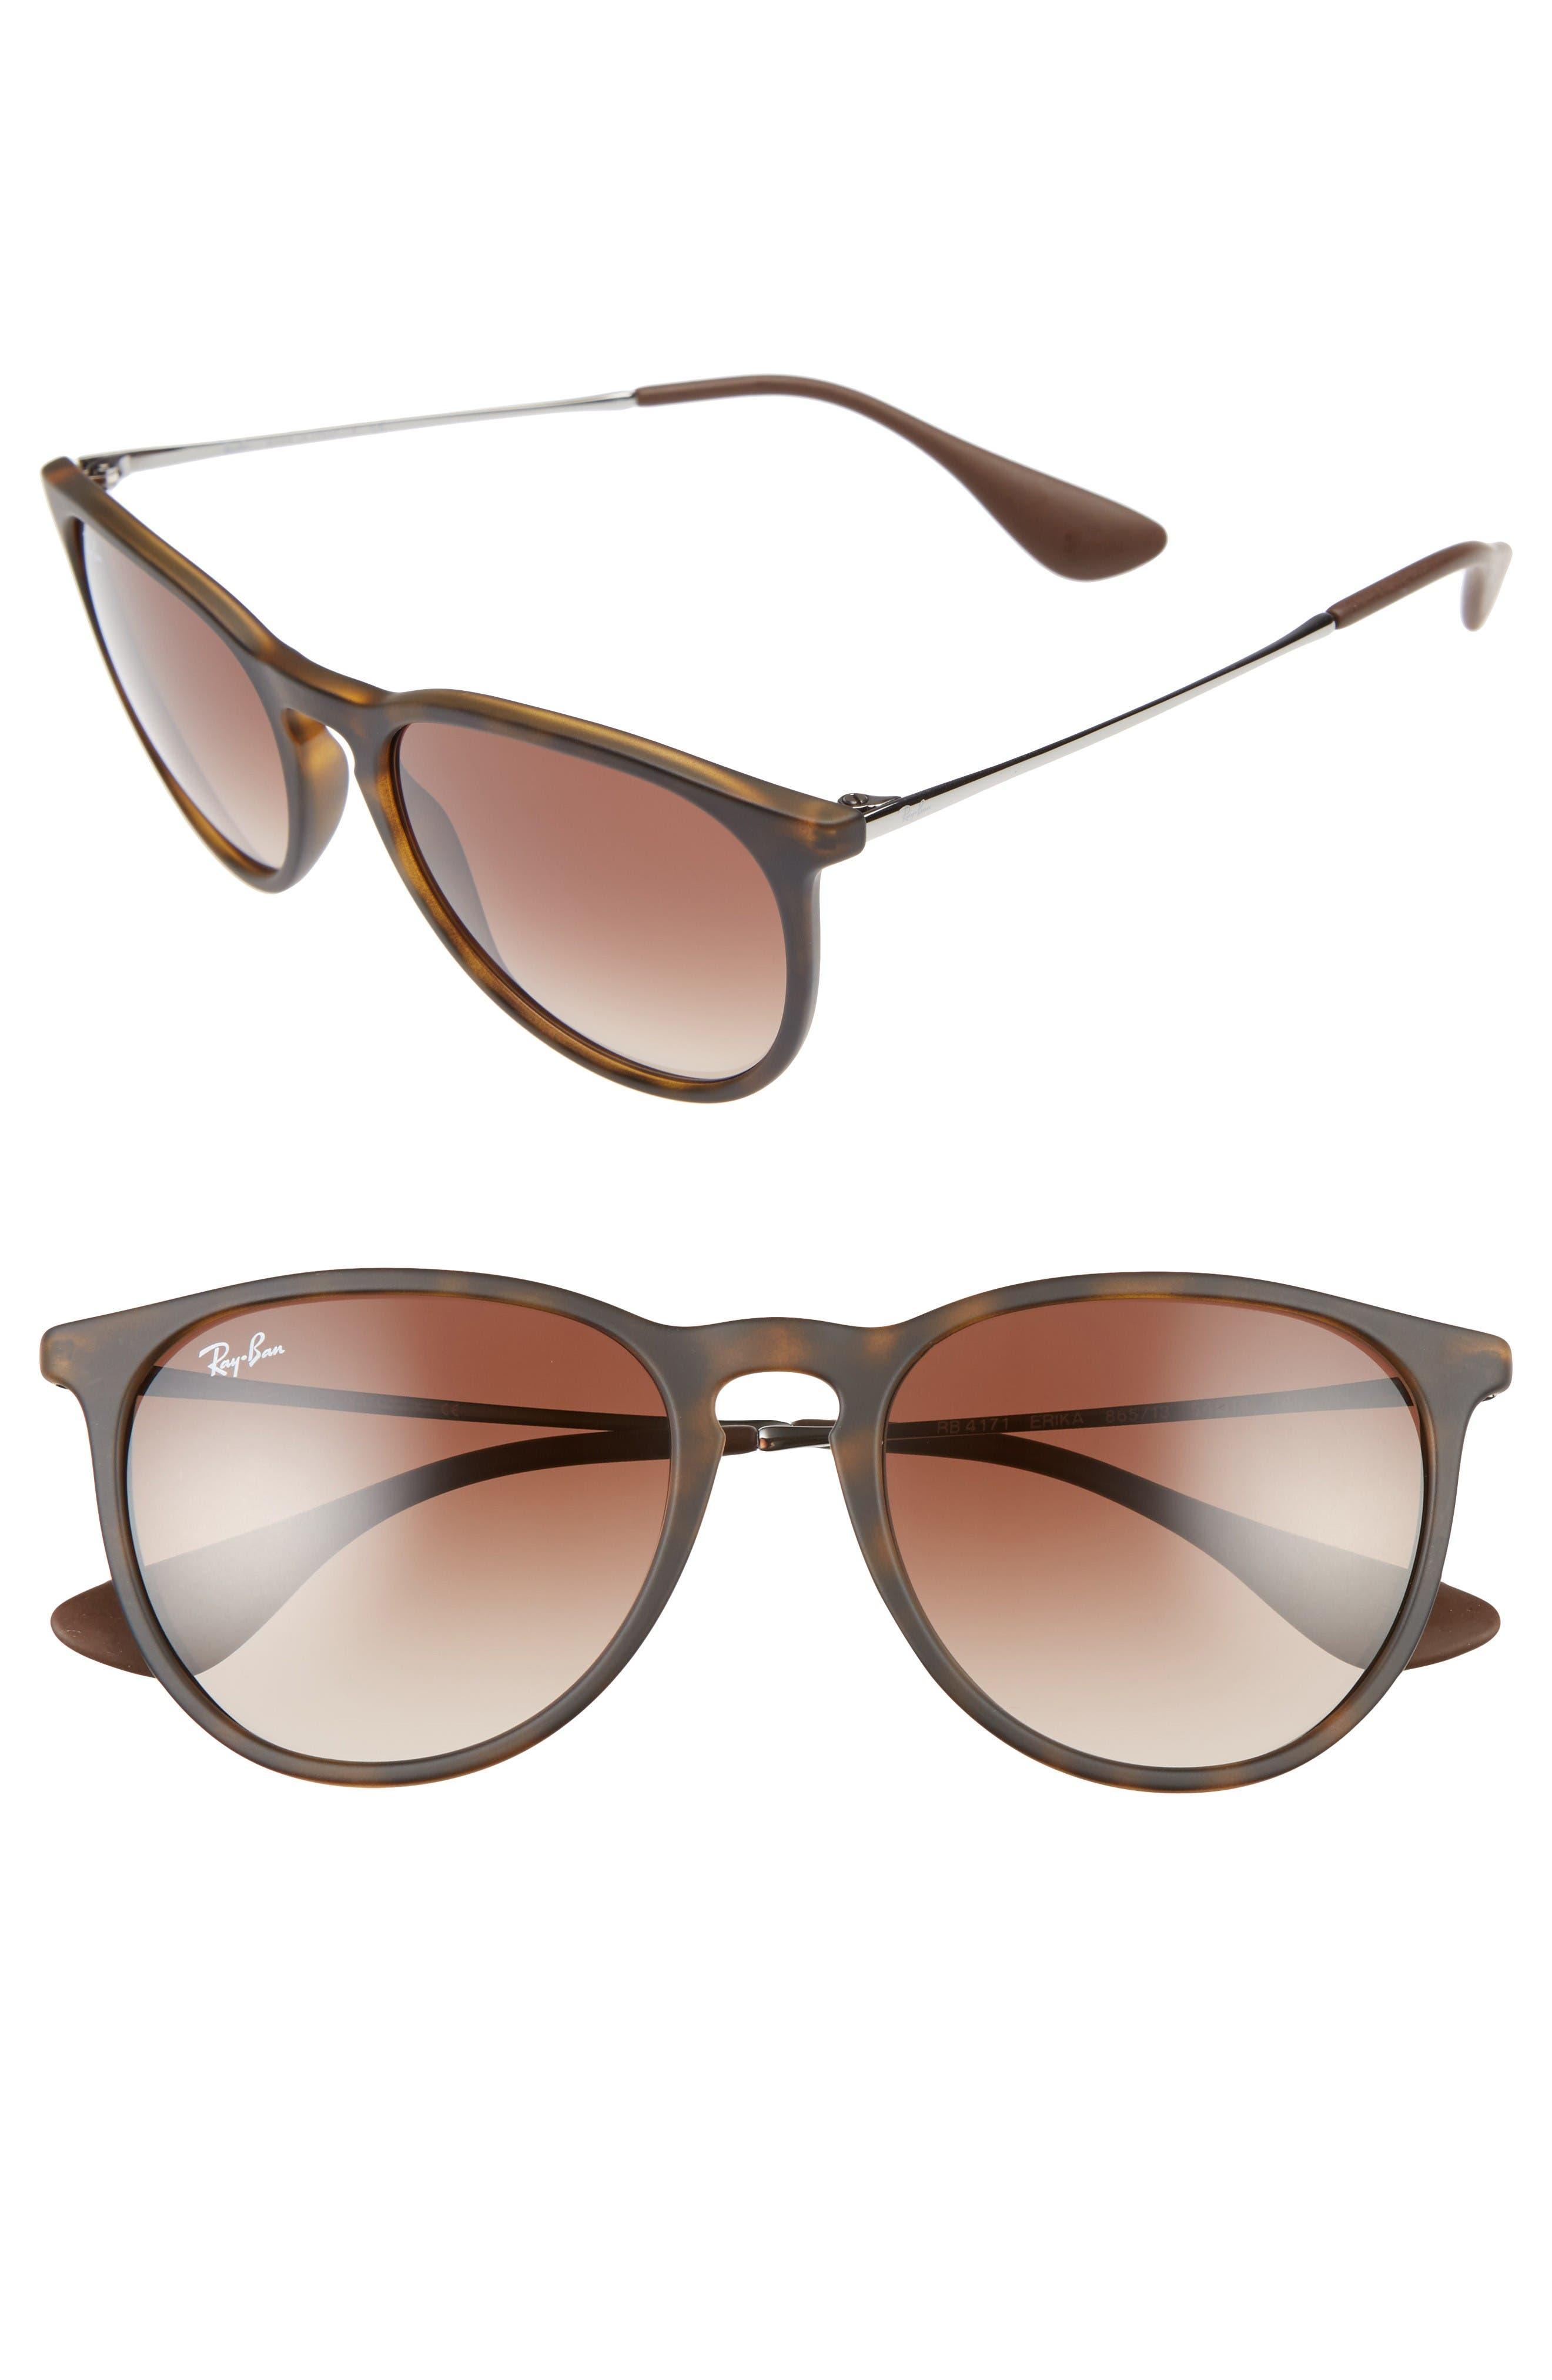 Main Image - Ray-Ban Erika Classic 54mm Sunglasses